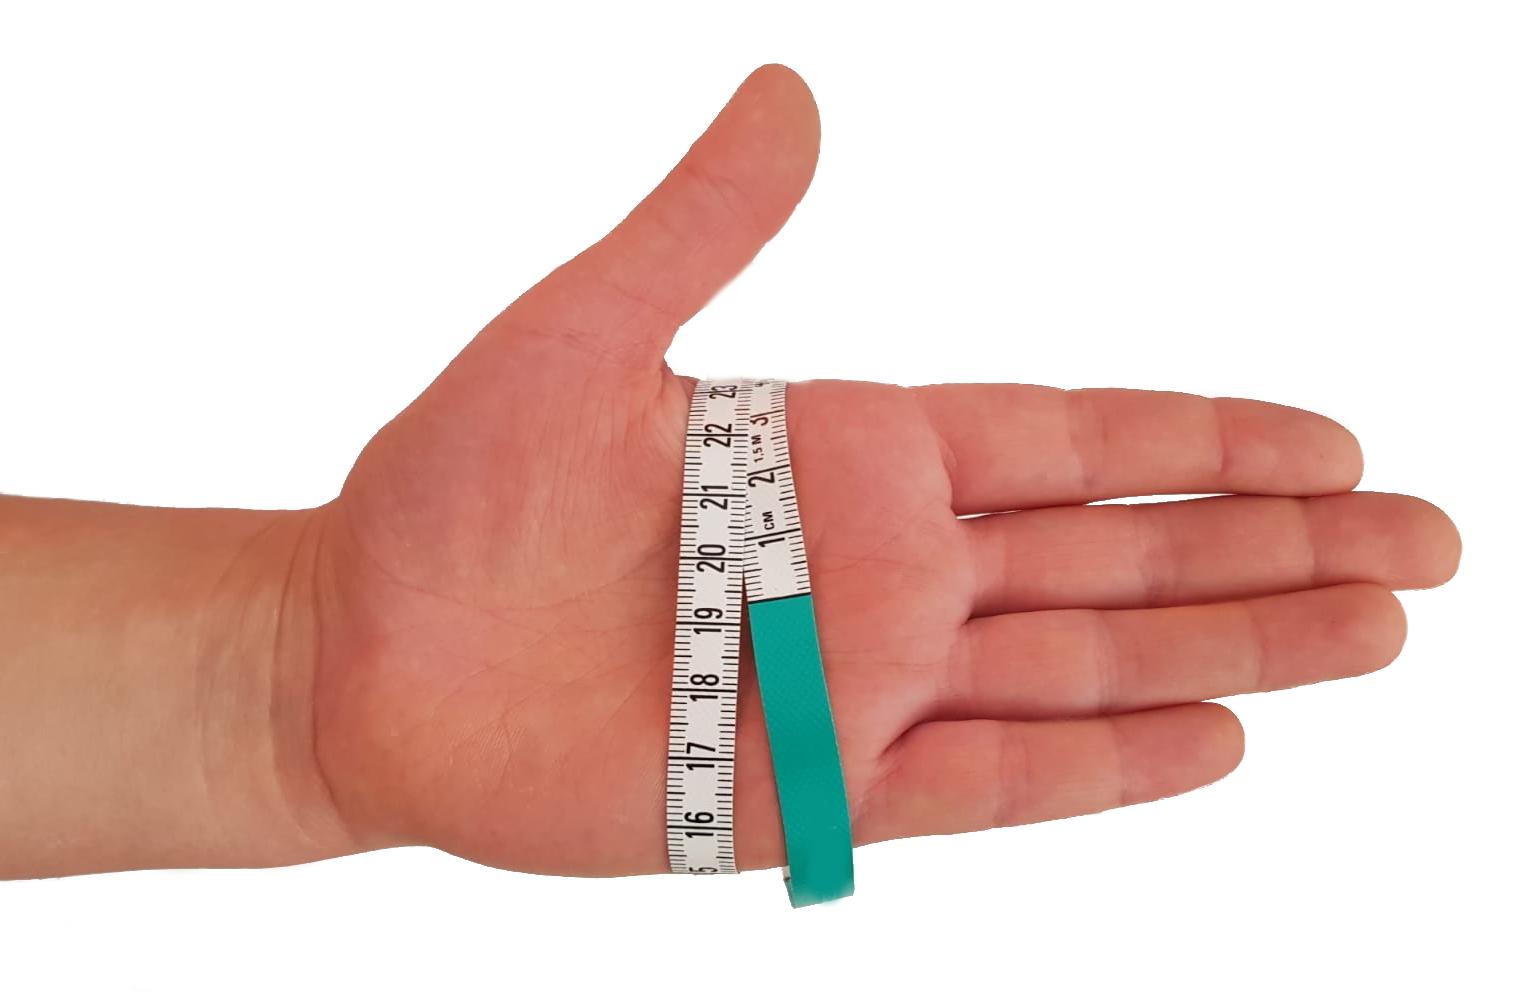 Faustlinge-Umfang-messen